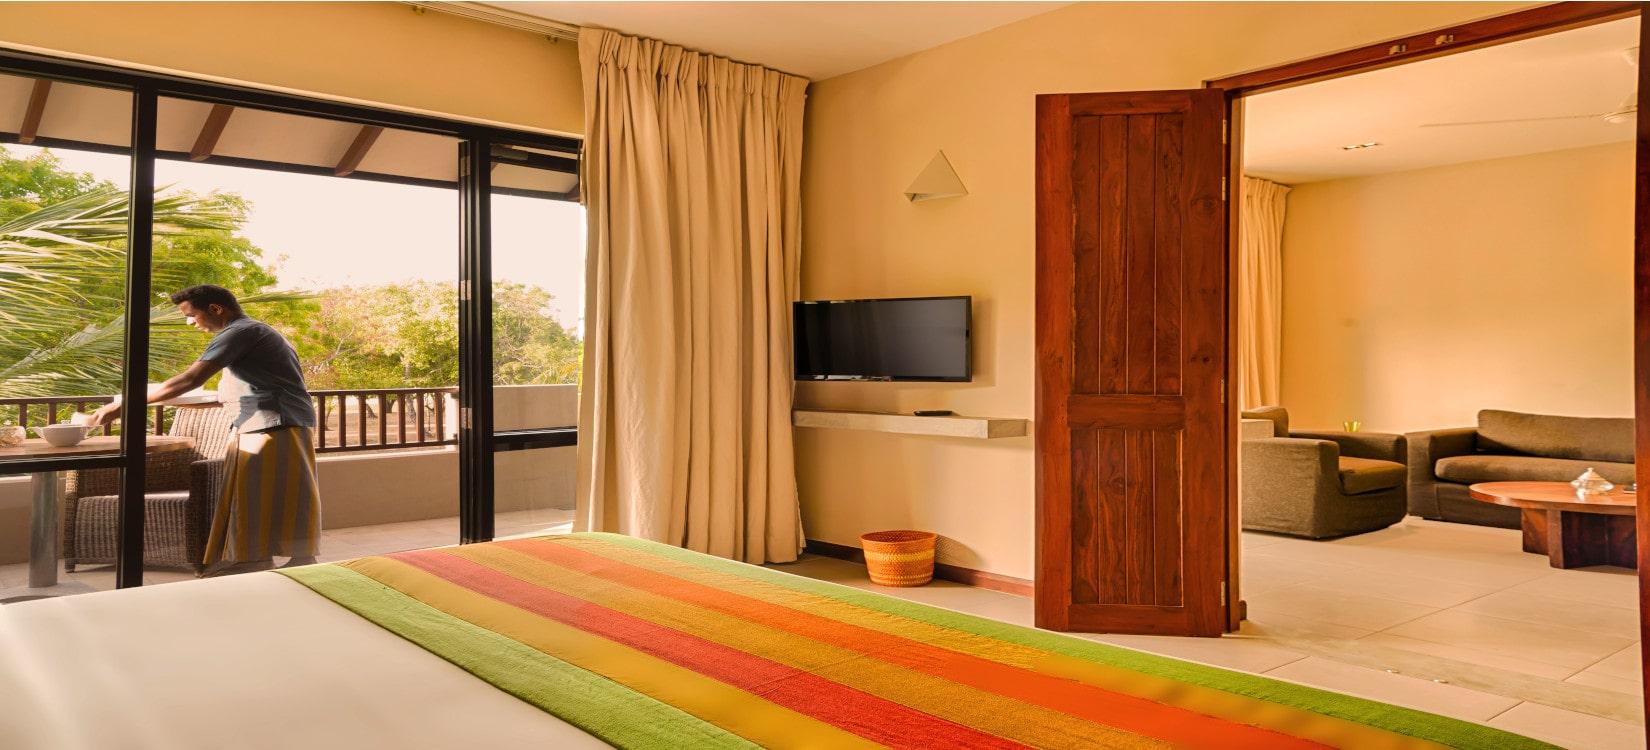 Sunrise Resort suite room-min